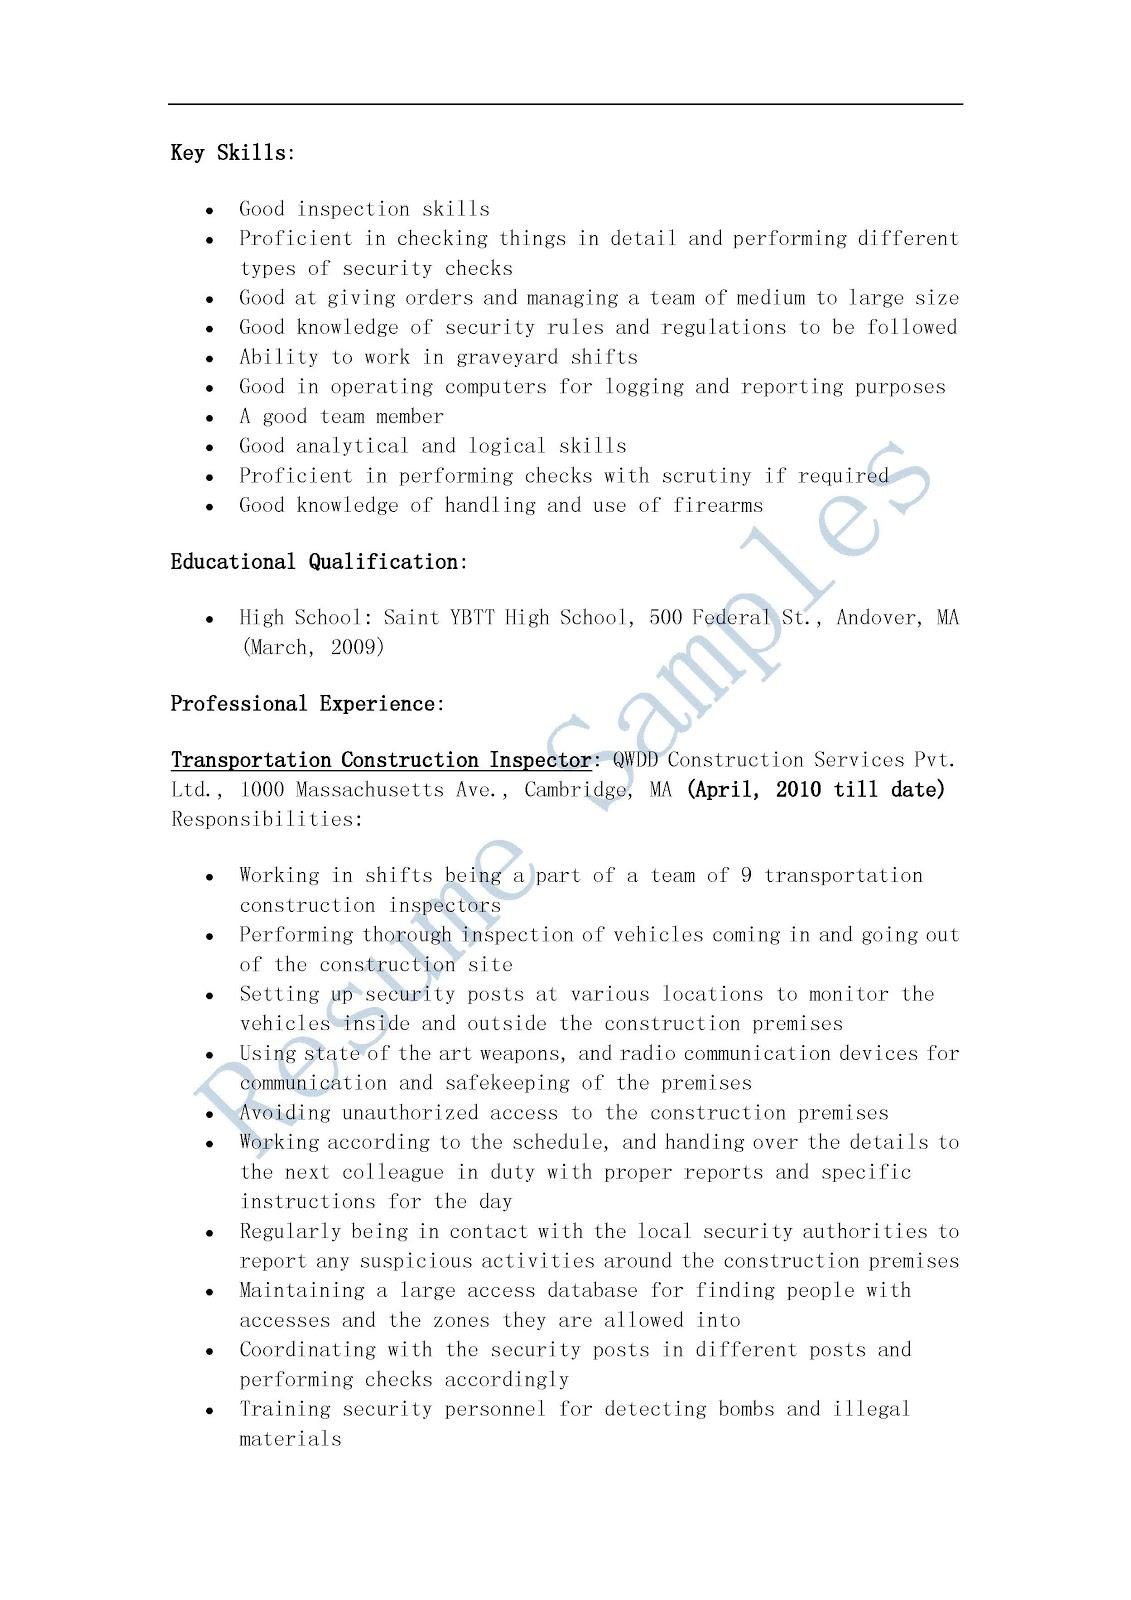 cover letter architectural technician customer service resume cover letter architectural technician resume and cover letter writing - Draftsman Resume Sample